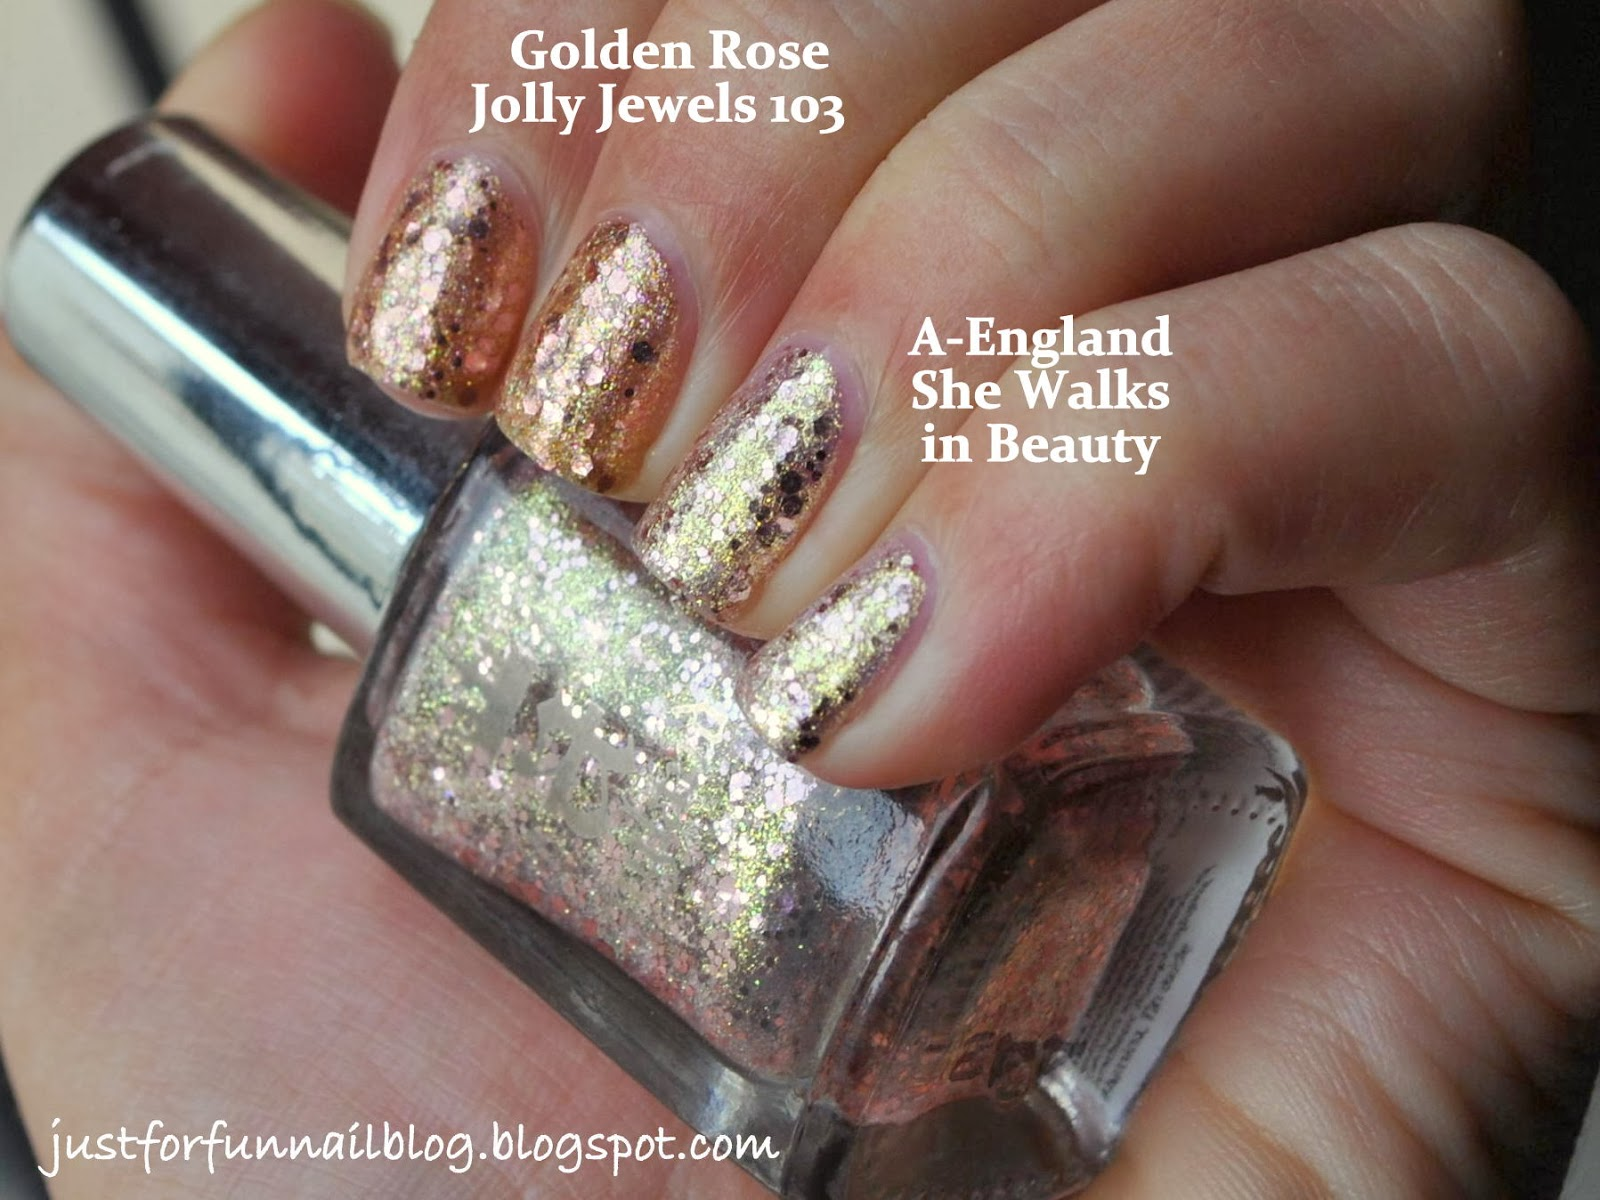 Comparison: A-England She Walks in Beauty VS. Golden Rose Jolly Jewels 103